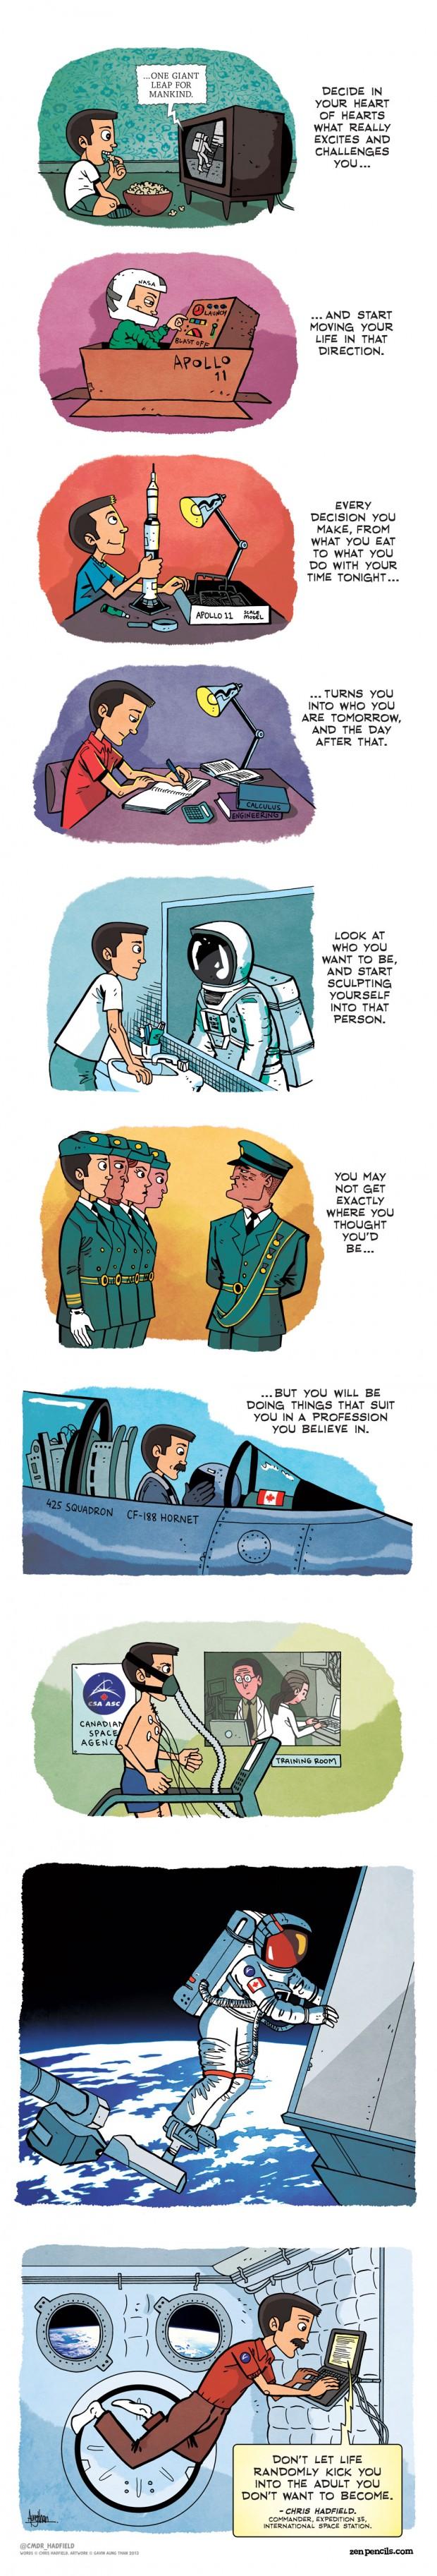 Chris Hadfield Advice - Comic